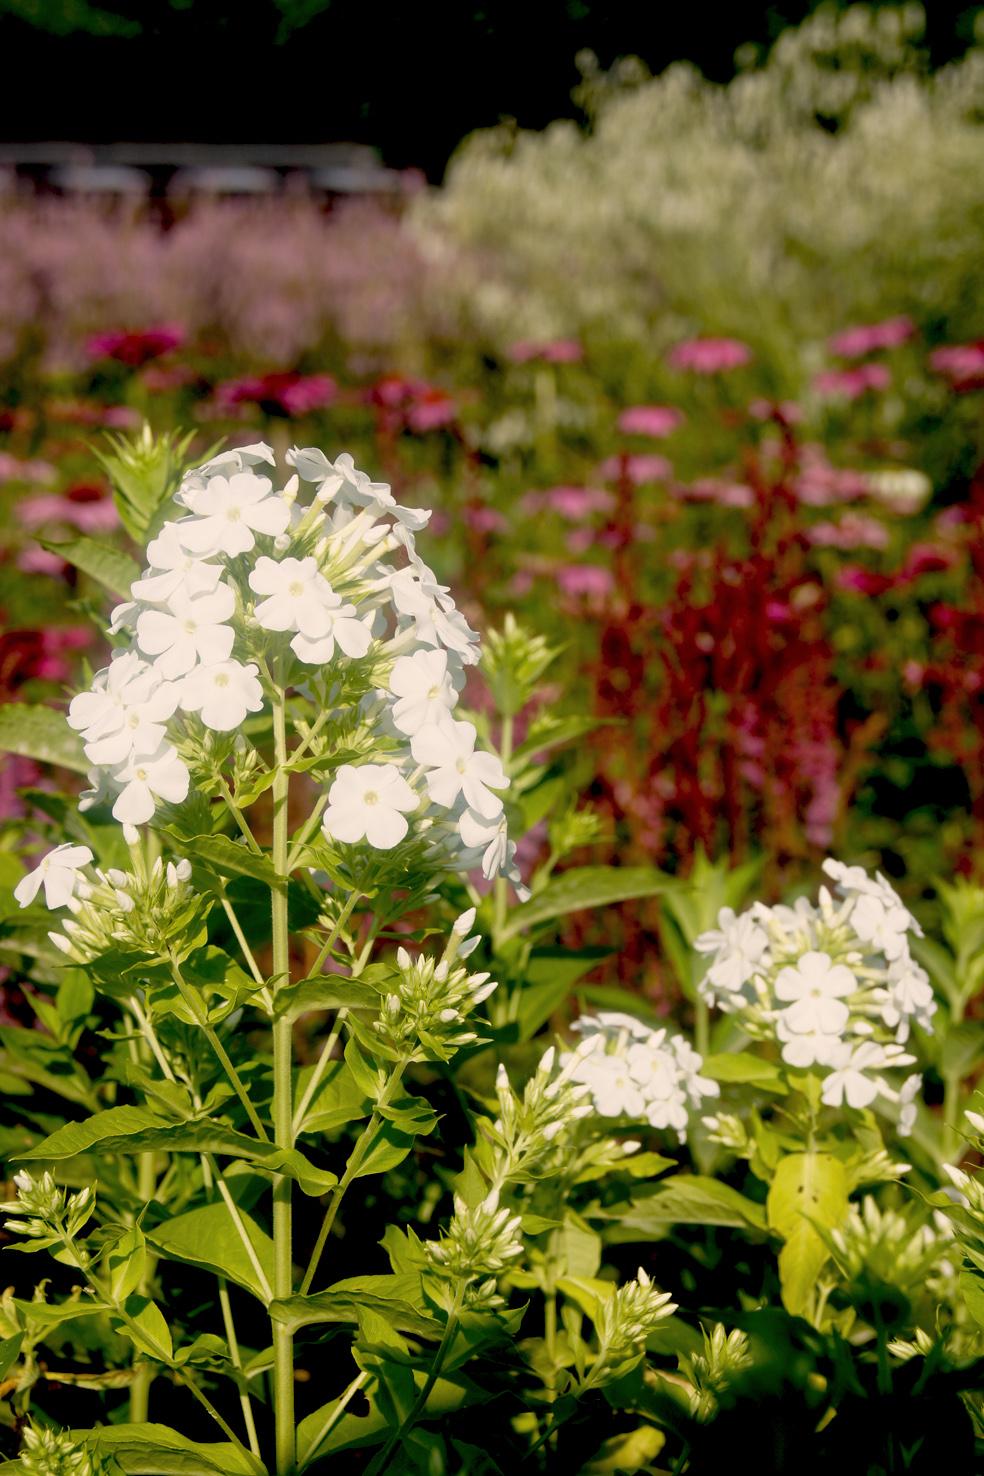 Phlox paniculata 'White Admiral' (Hohe Garten-Flammenblume)